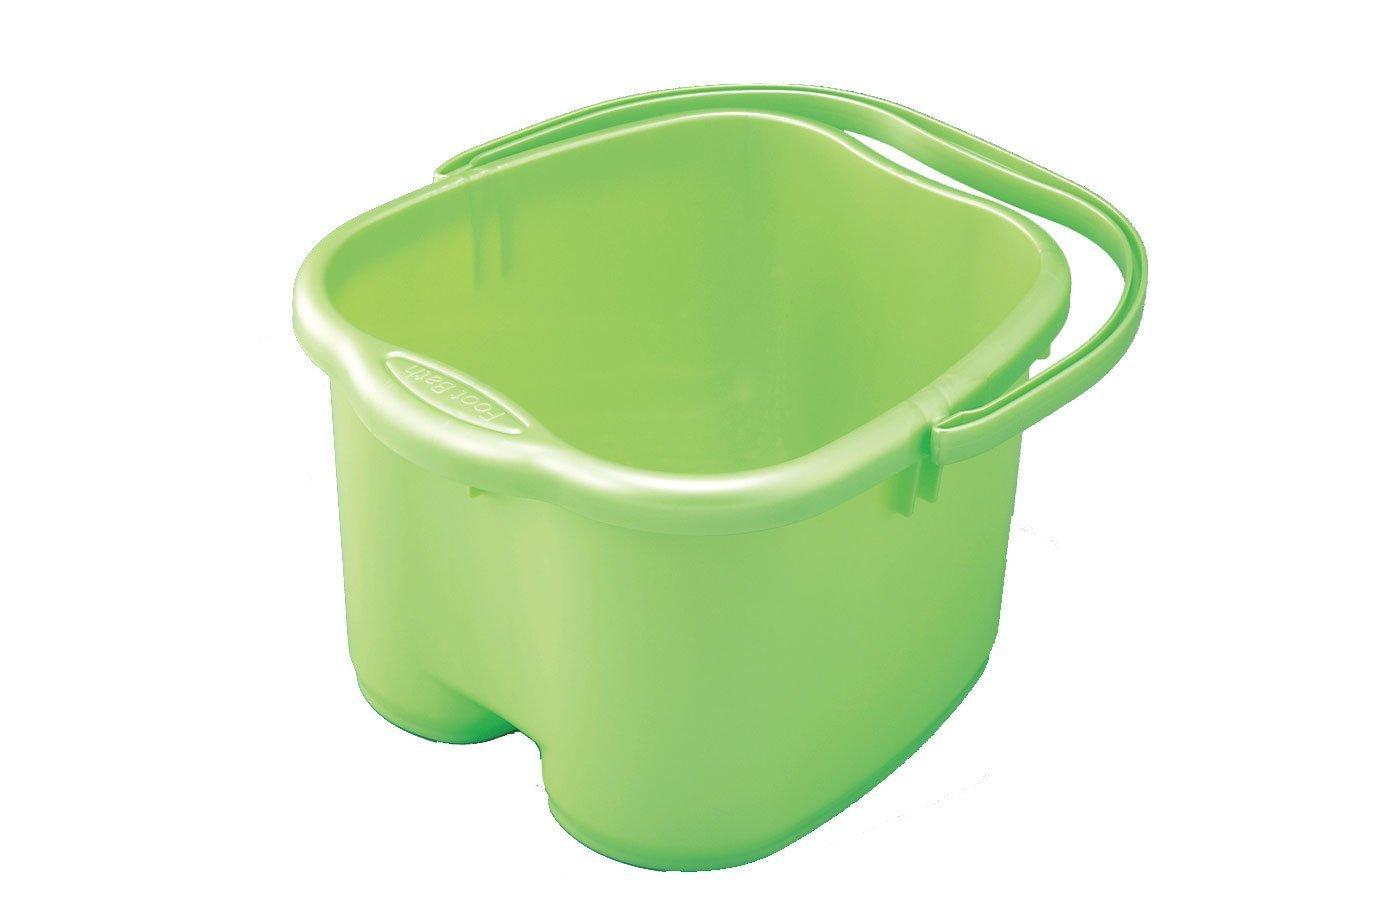 Inomata Green Foot Detox Massage Spa Bucket #0012 2617